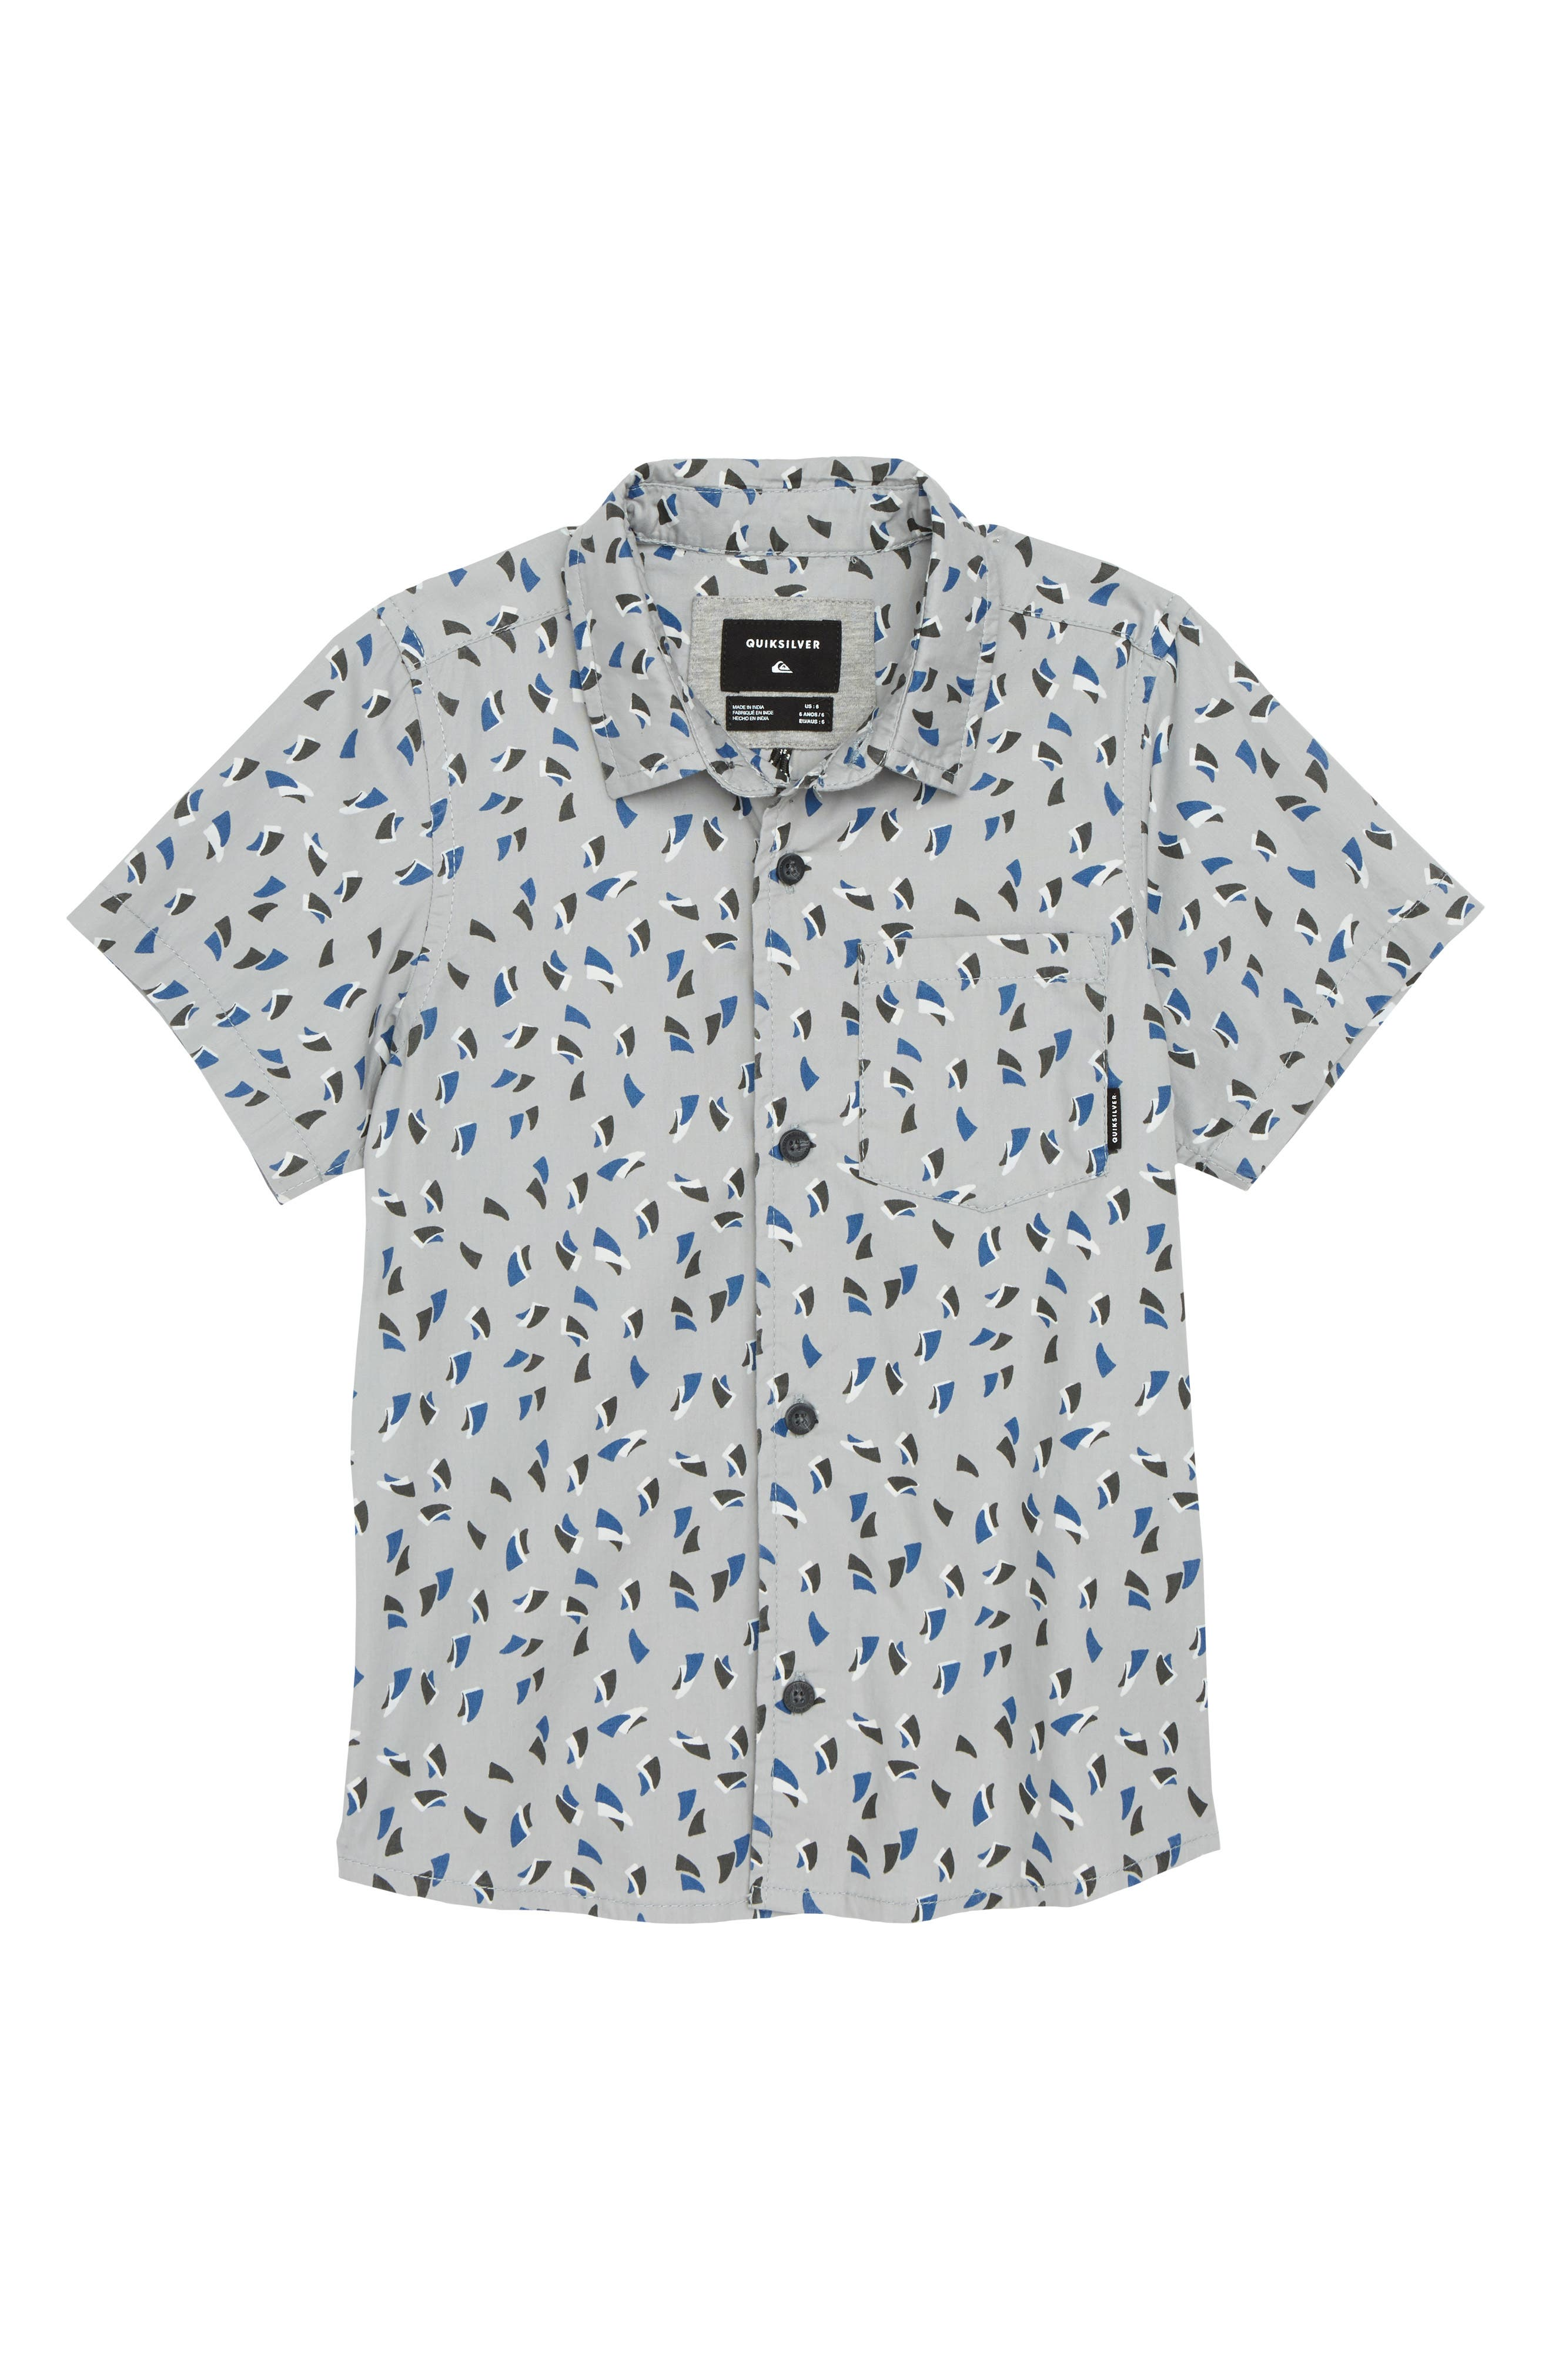 Akan Waters Woven Shirt,                             Main thumbnail 1, color,                             SLEET MECHANICAL